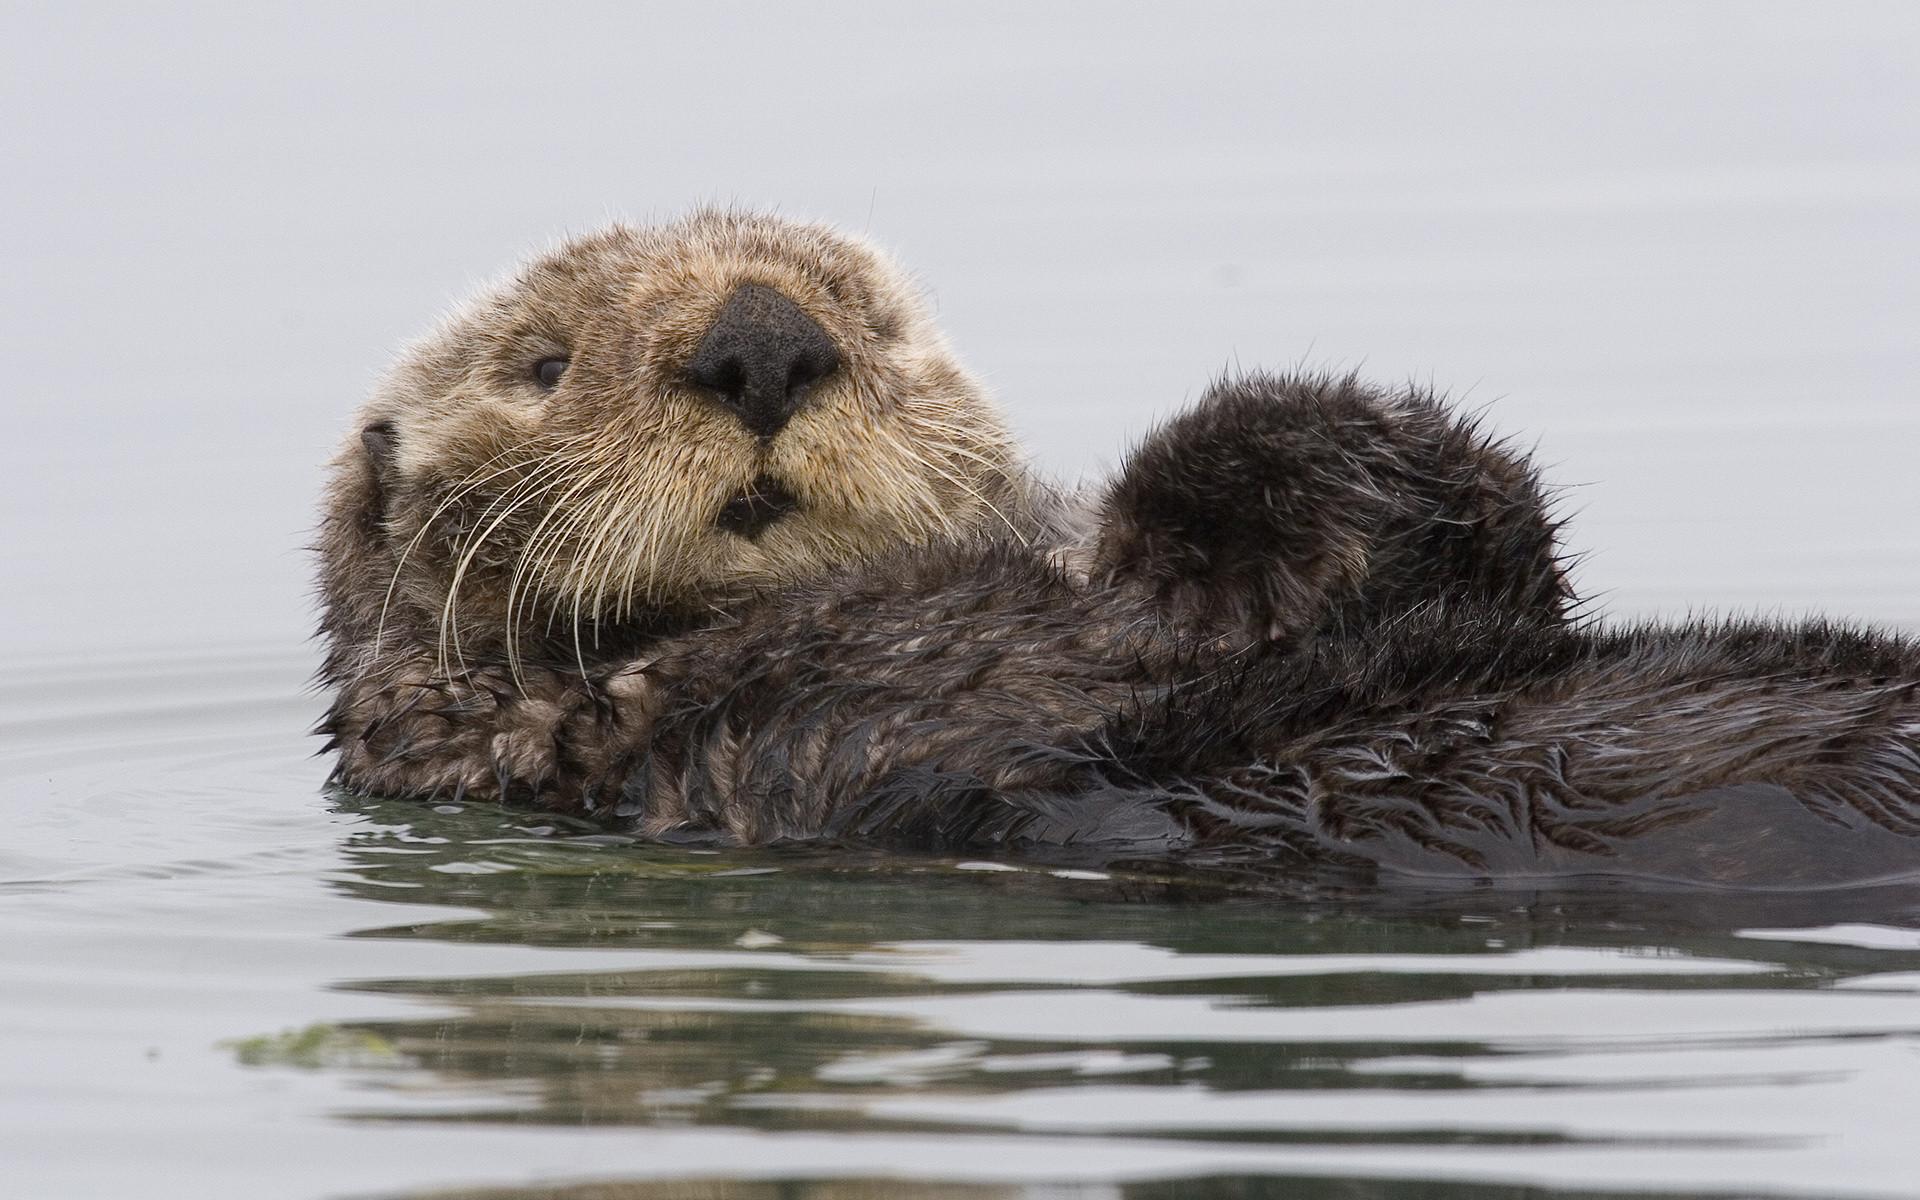 Res: 1920x1200, Sea Otter Preening Itself In Morro Bay